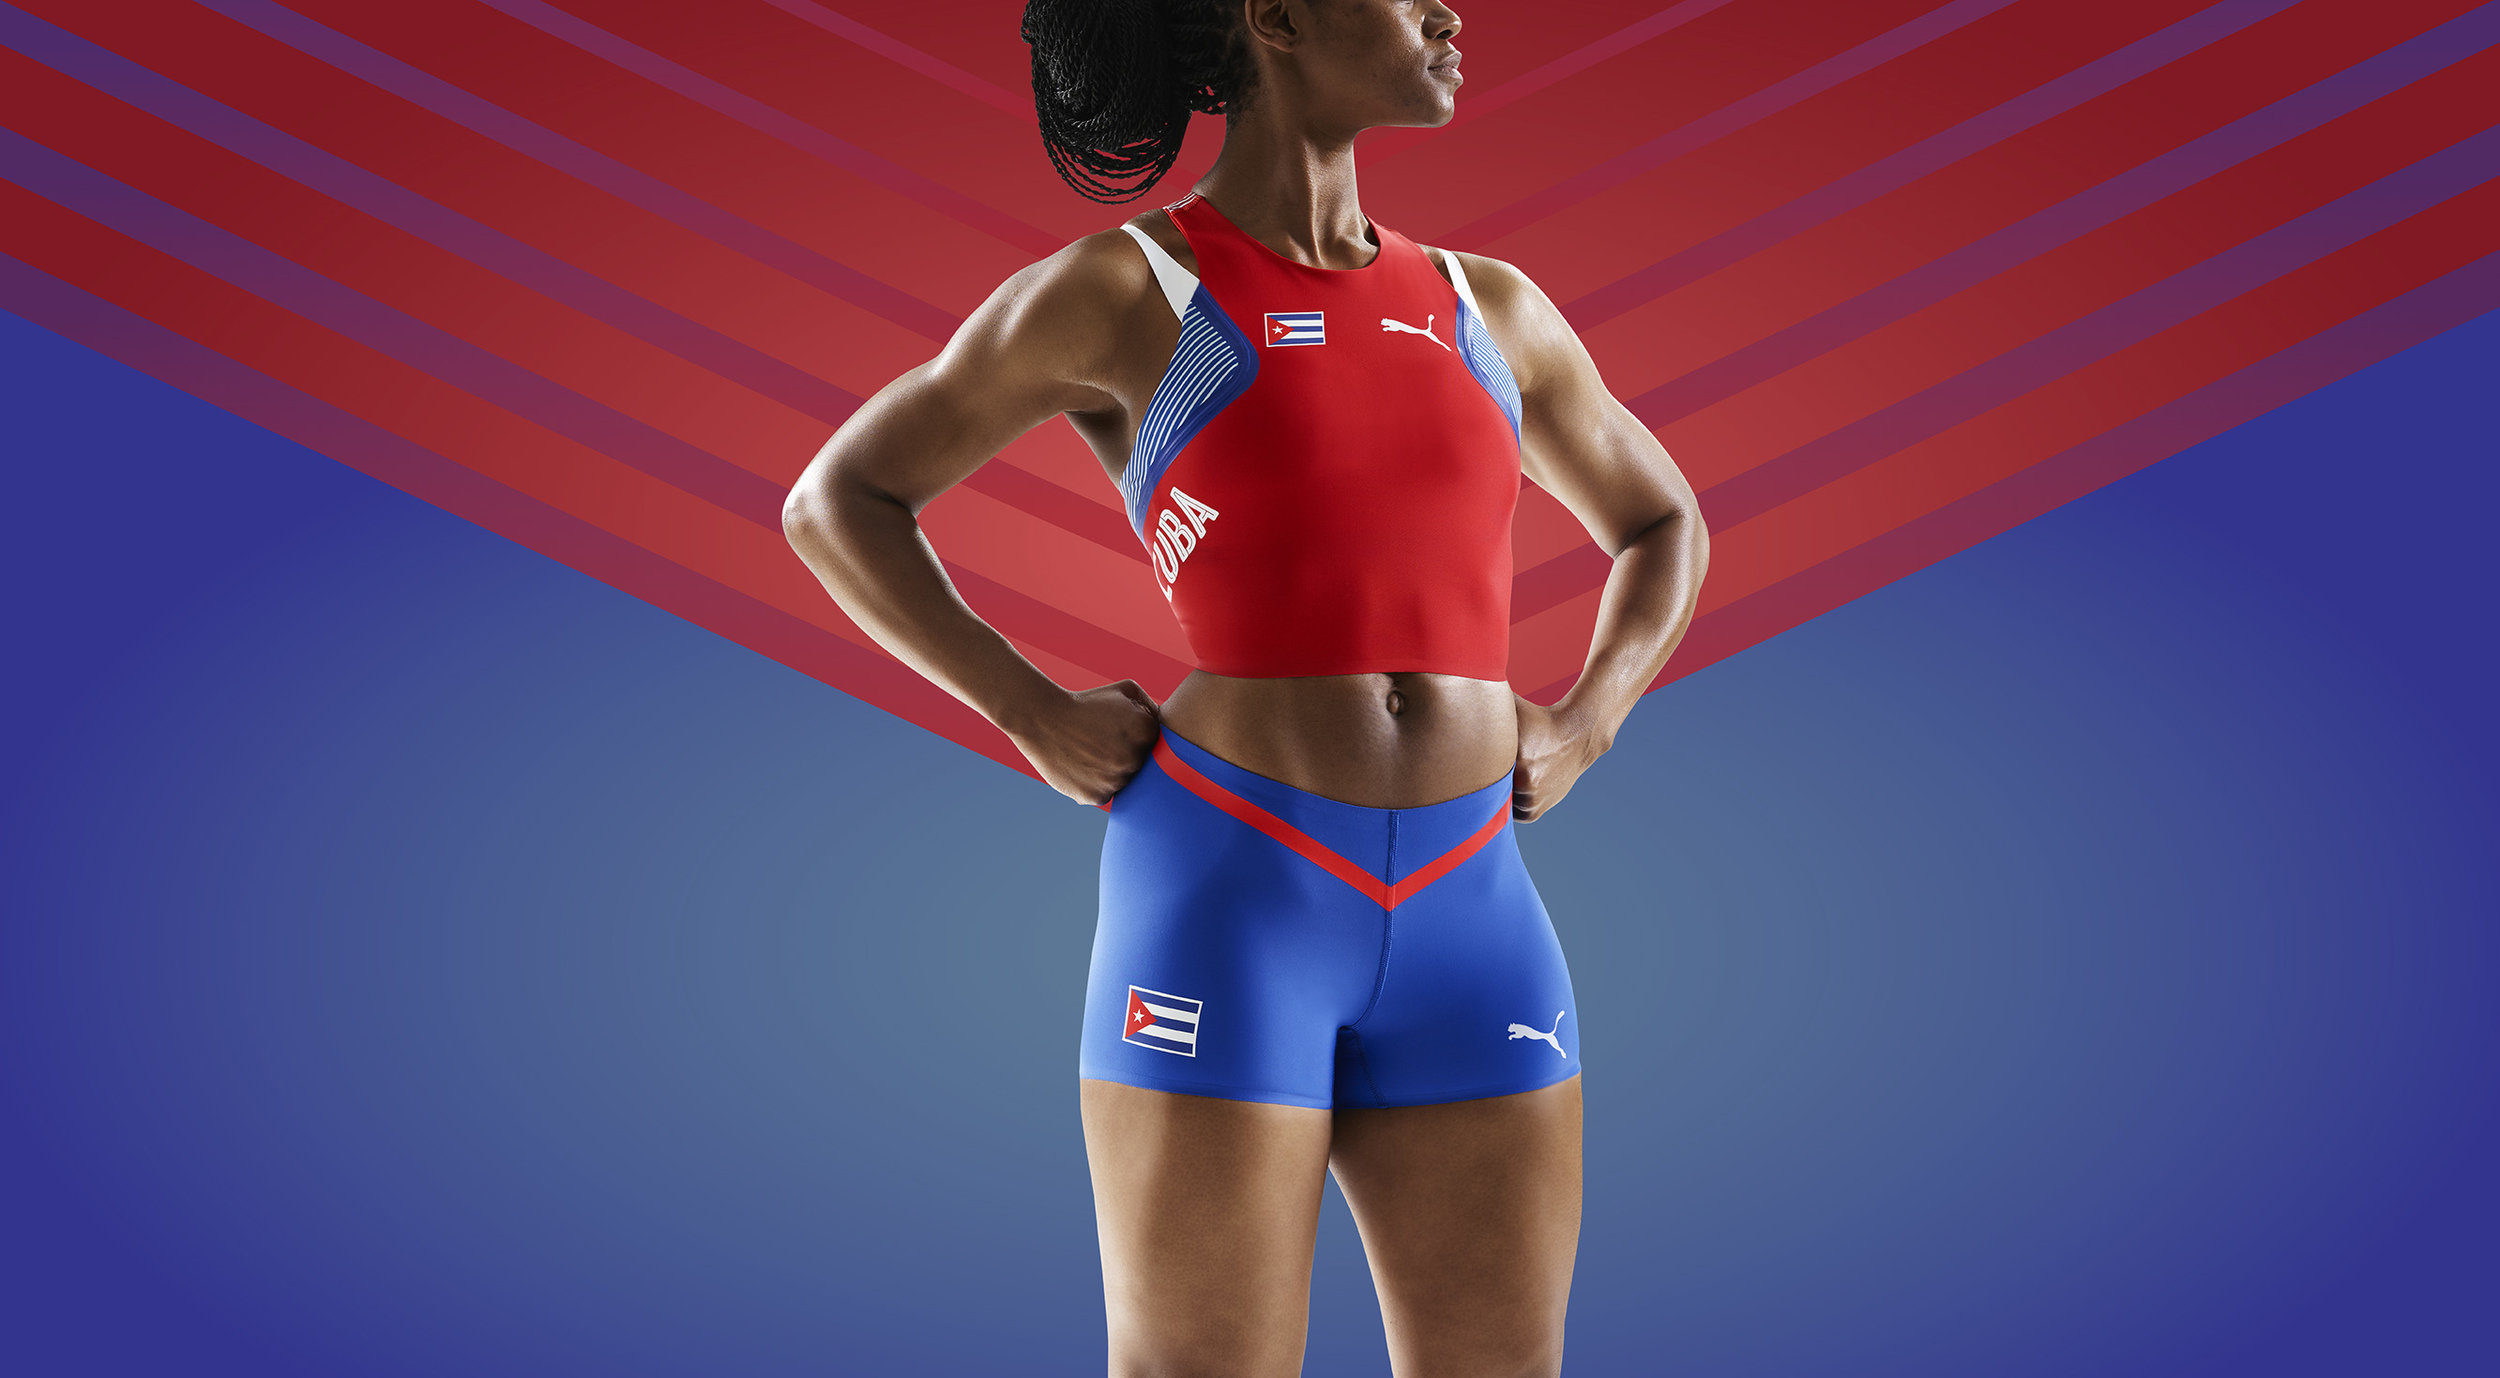 16aw_rt_running_federation-kits_xcuba_womens_0060_rgb.jpg